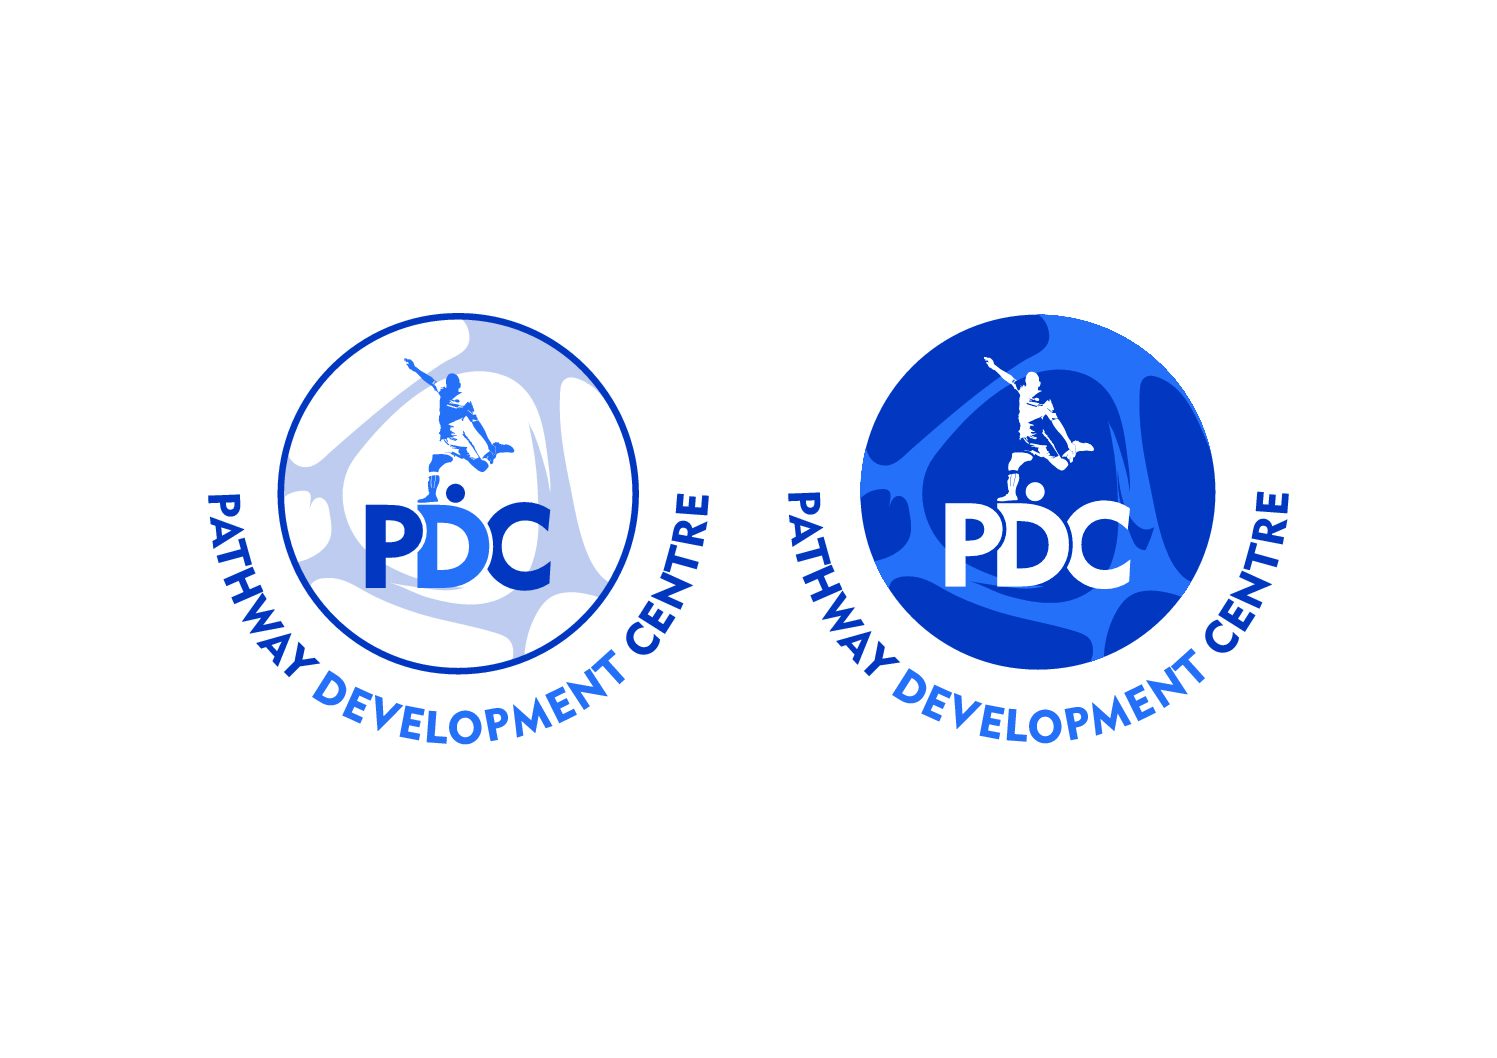 Pathway Development Centre